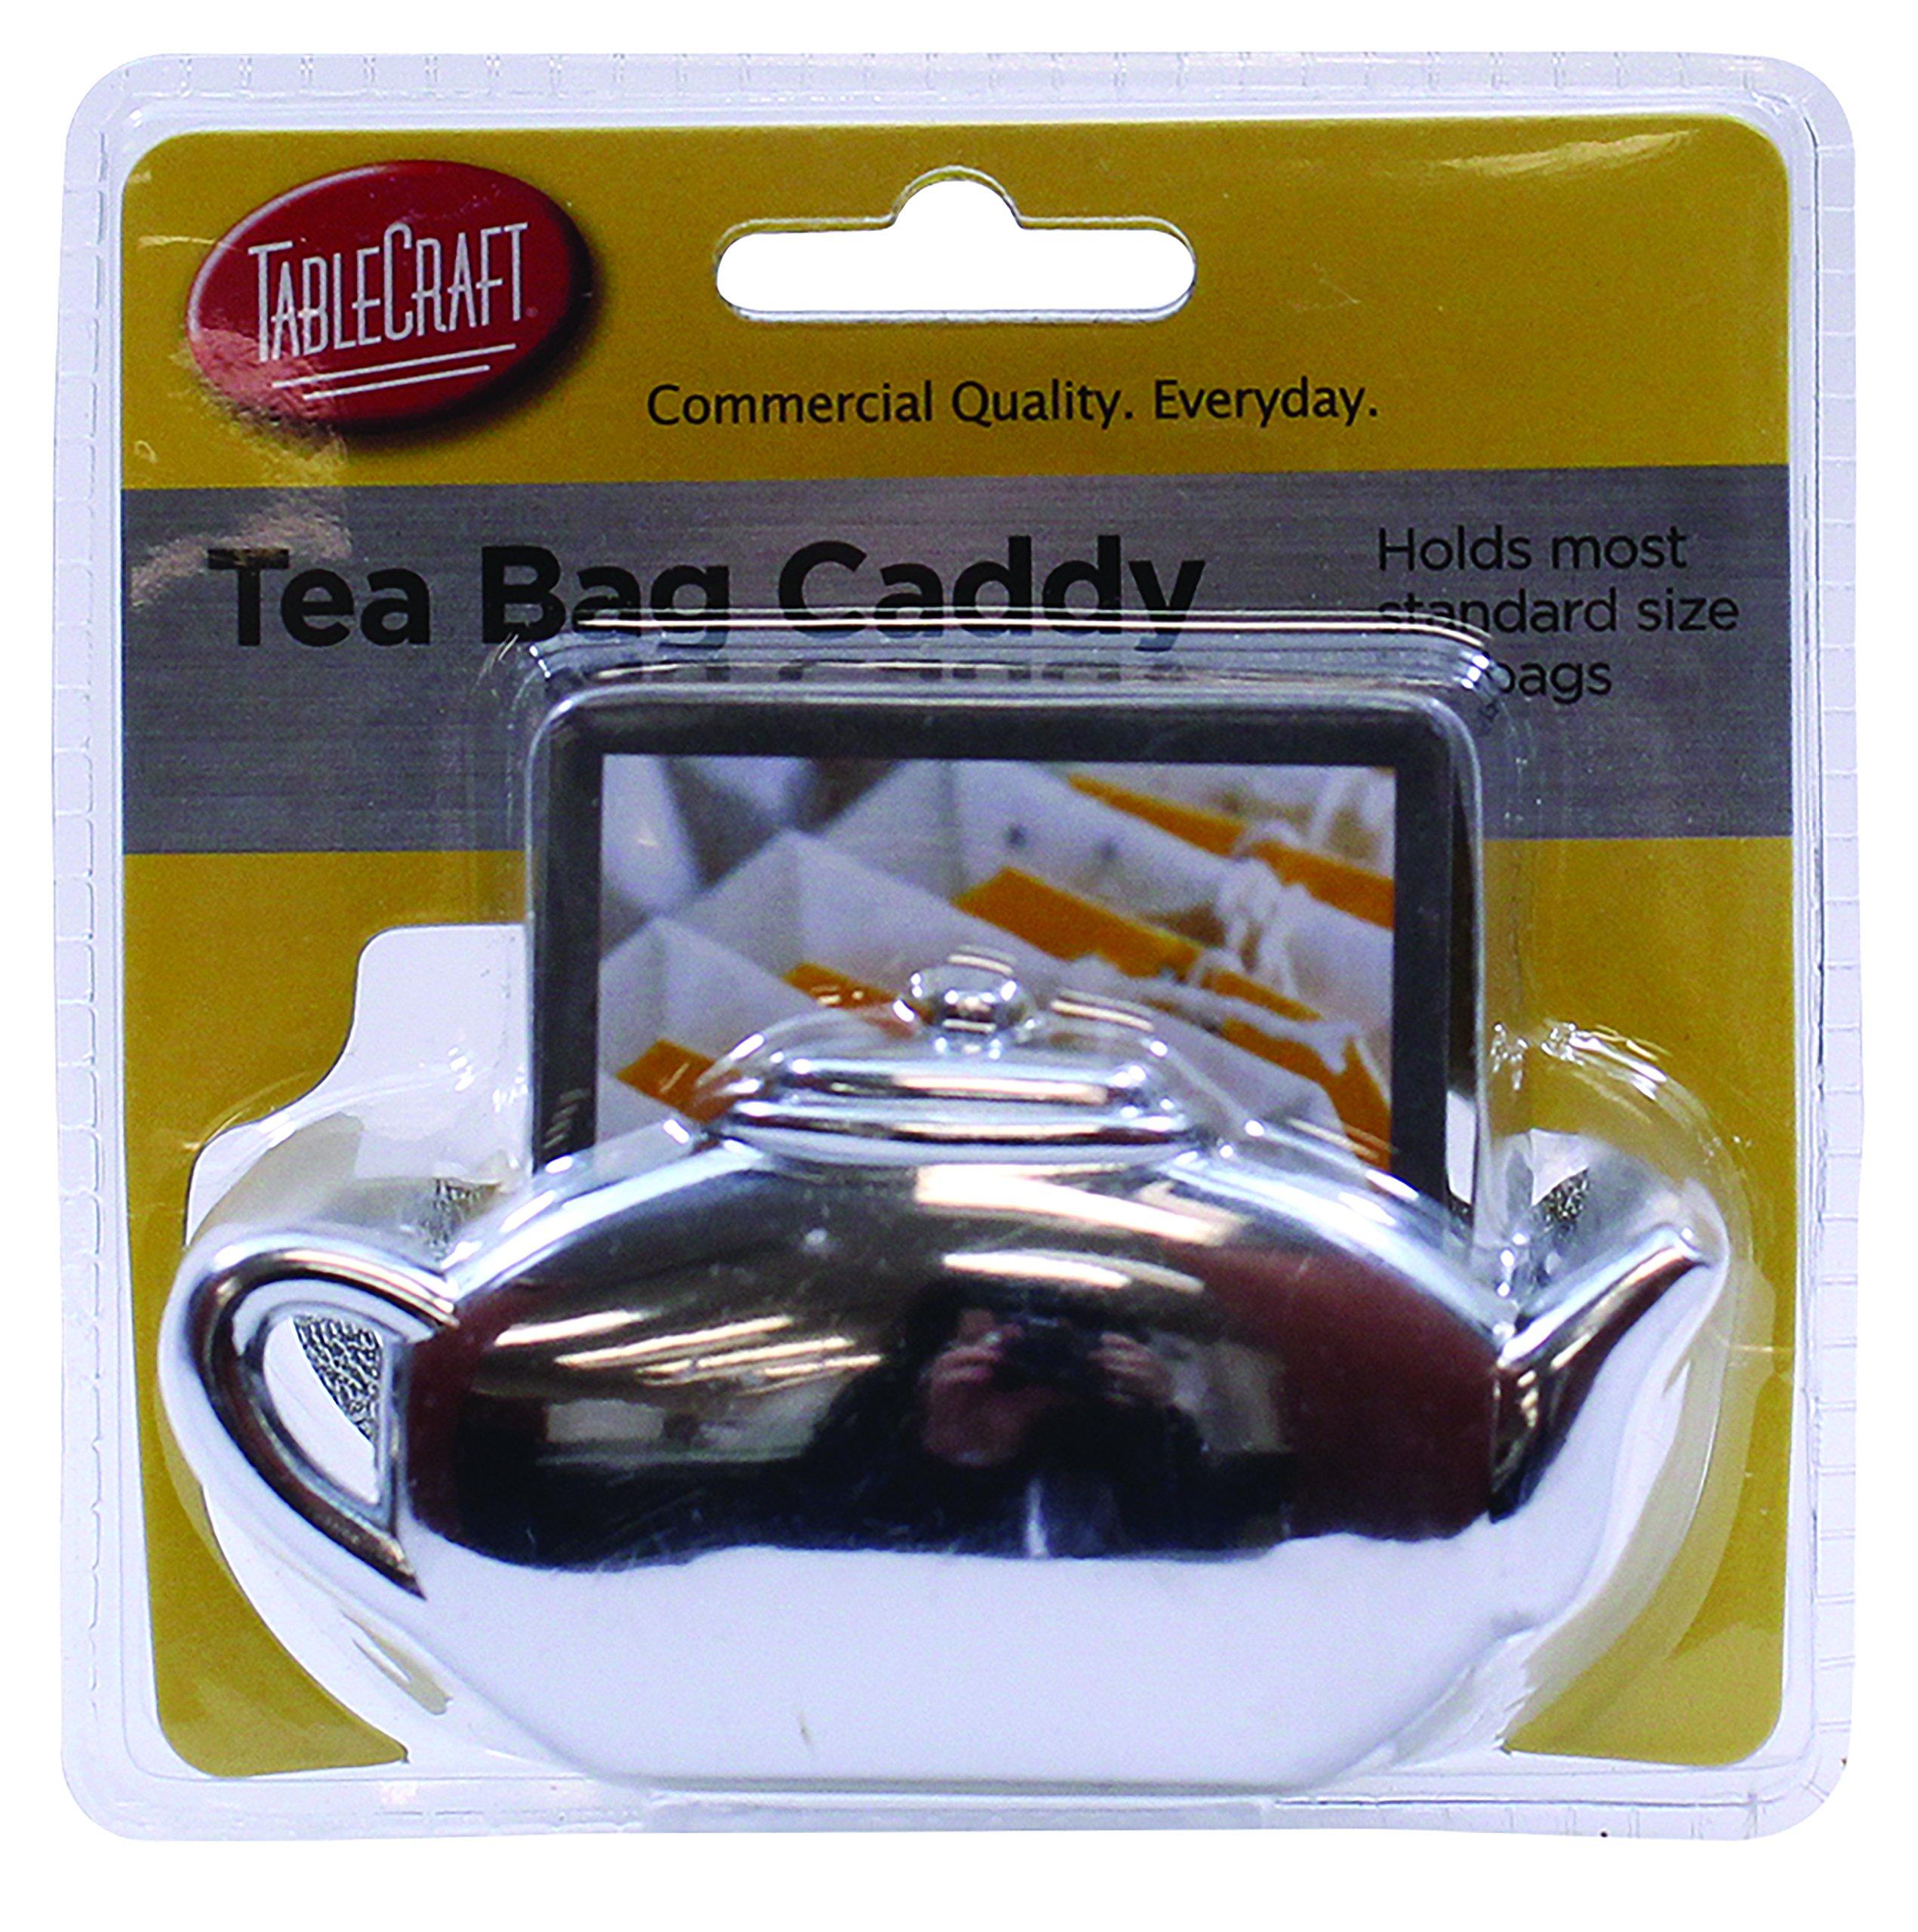 Tablecraft H1232H Tea Bag Caddy, Small, Silver